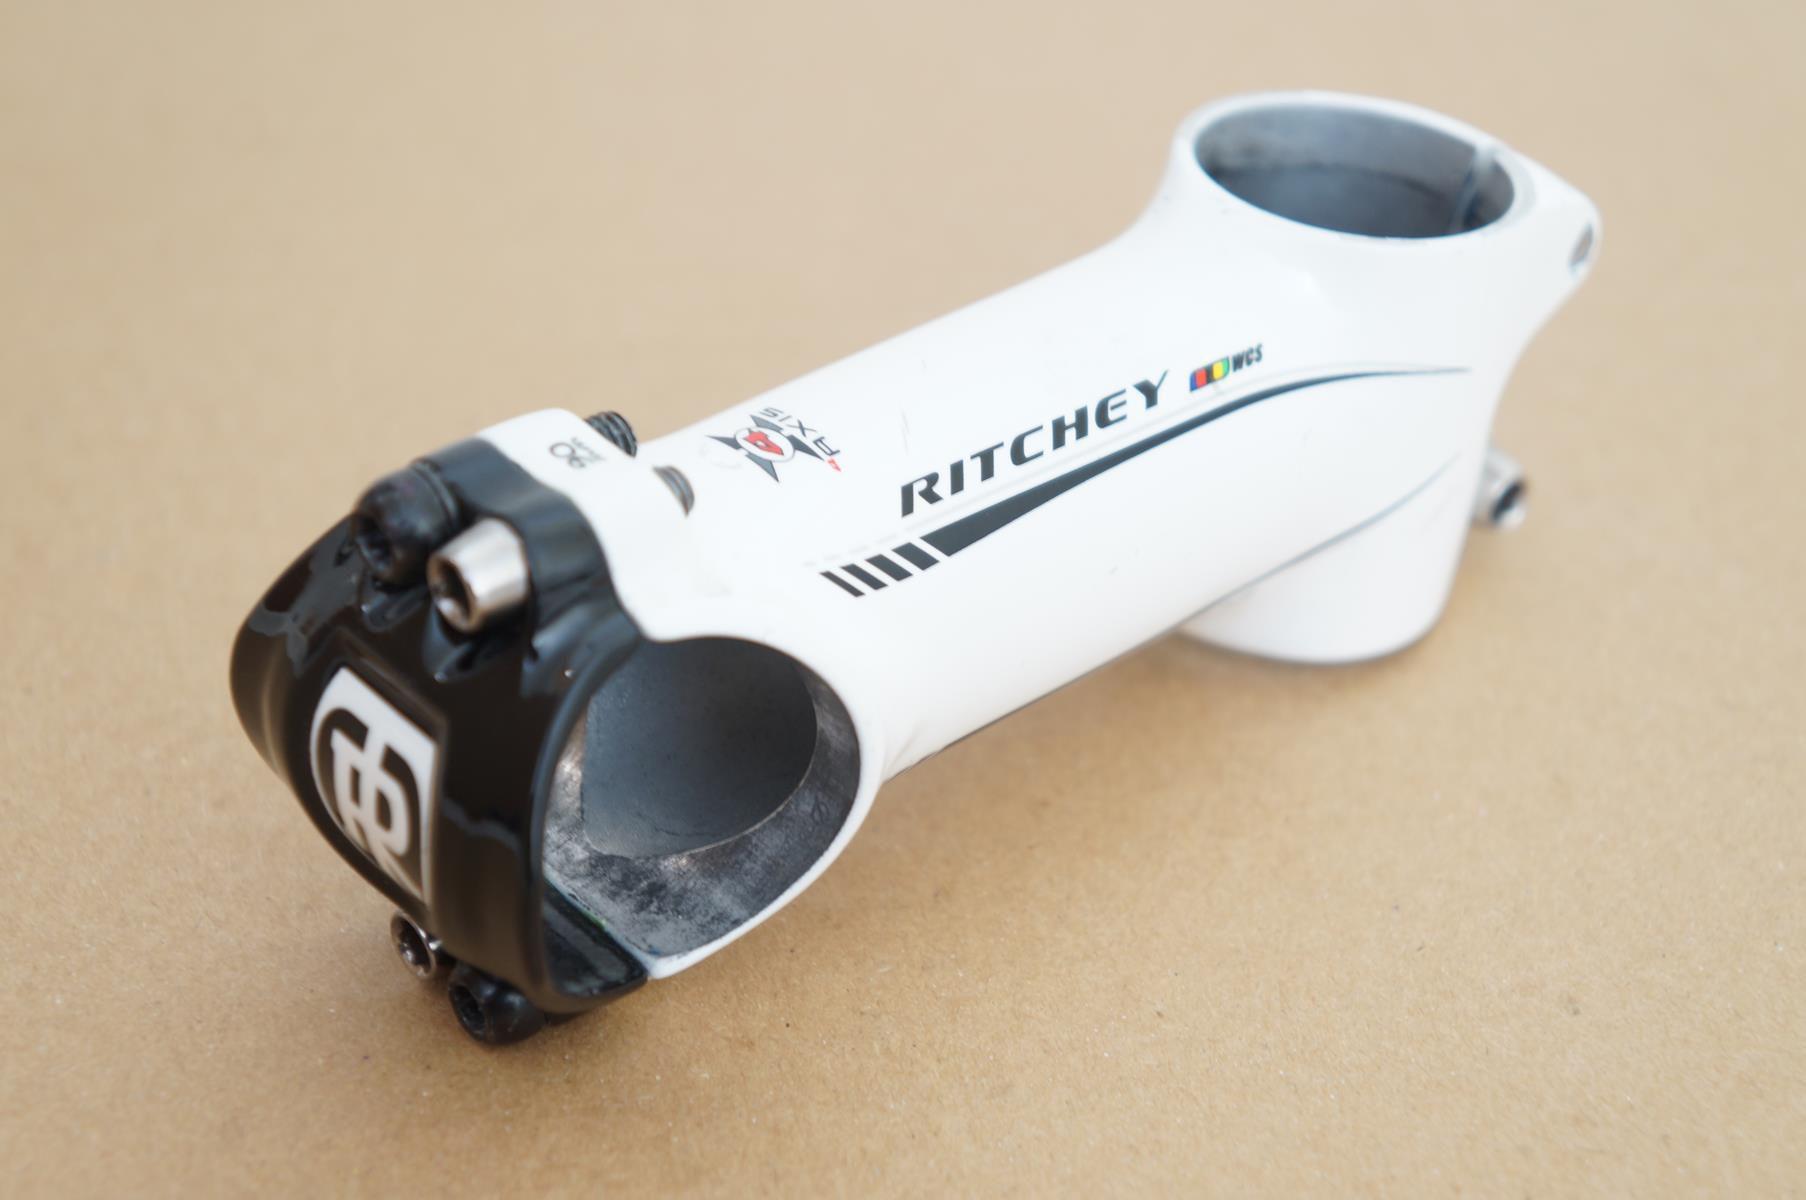 Mesa Avanço Bicicleta Ritchey WCS Aluminio 90mm Branca 31.8mm 6º/84º 110g - USADO